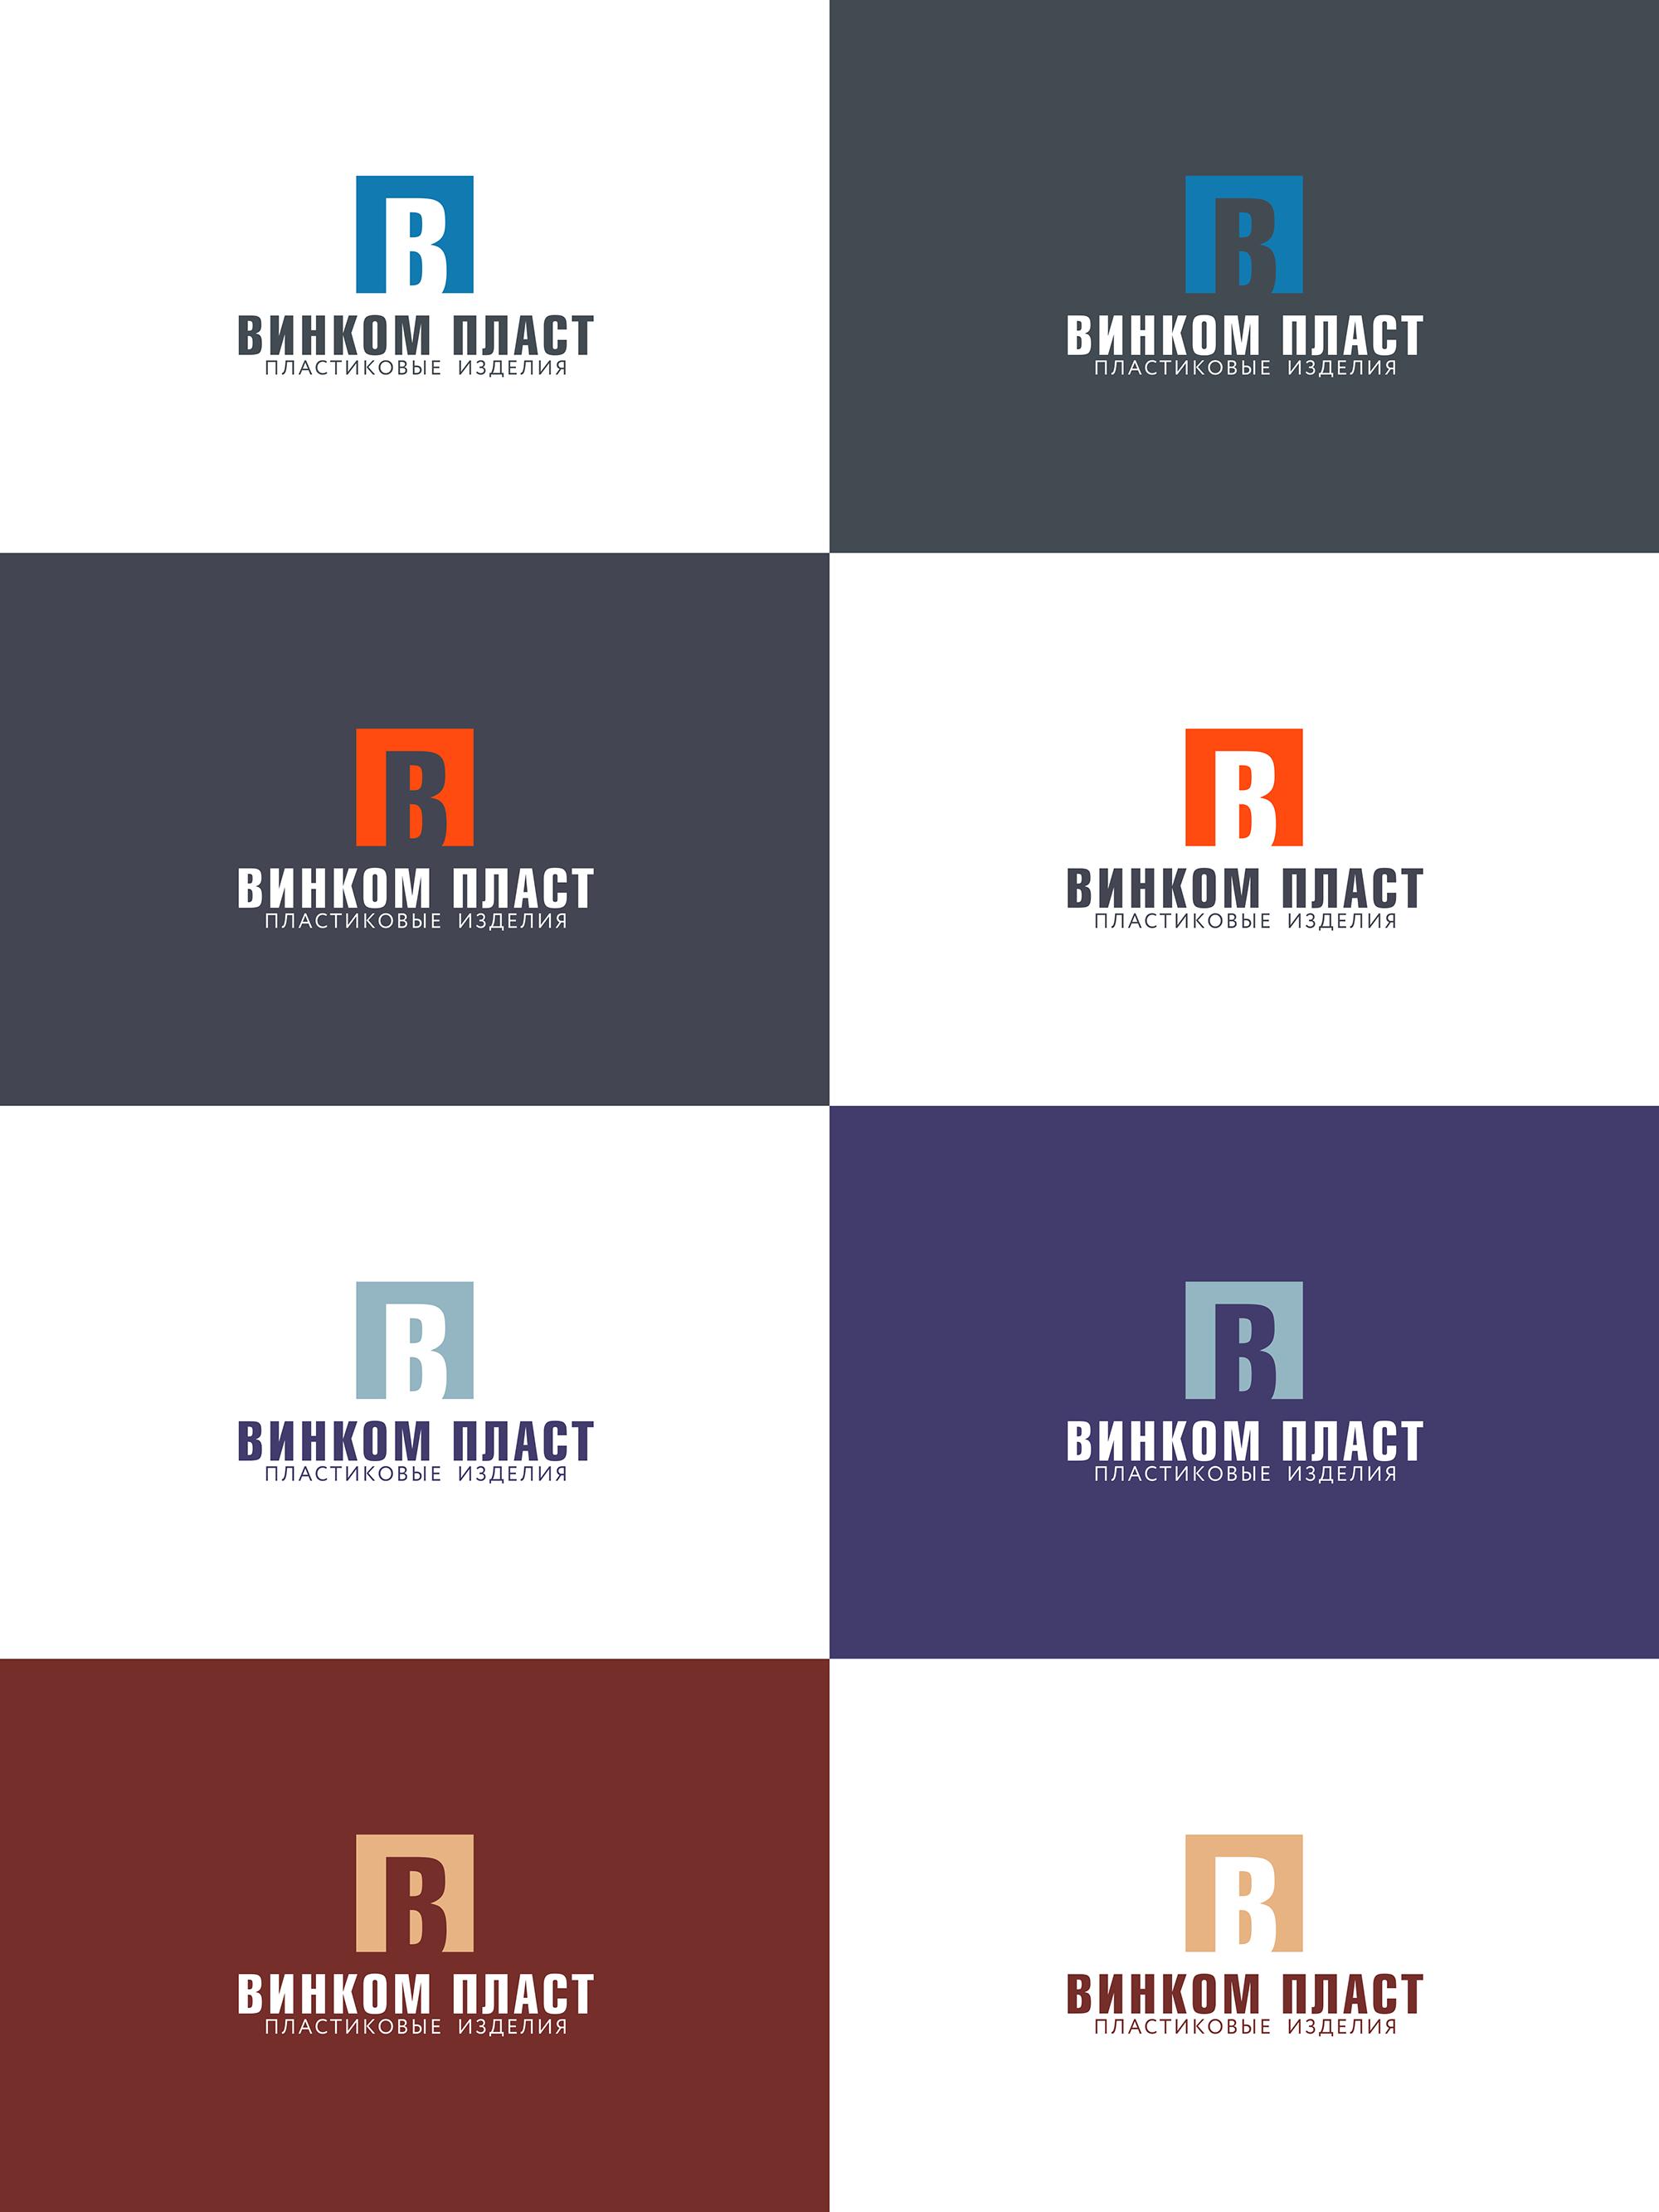 Логотип, фавикон и визитка для компании Винком Пласт  фото f_2985c408031baf8b.png